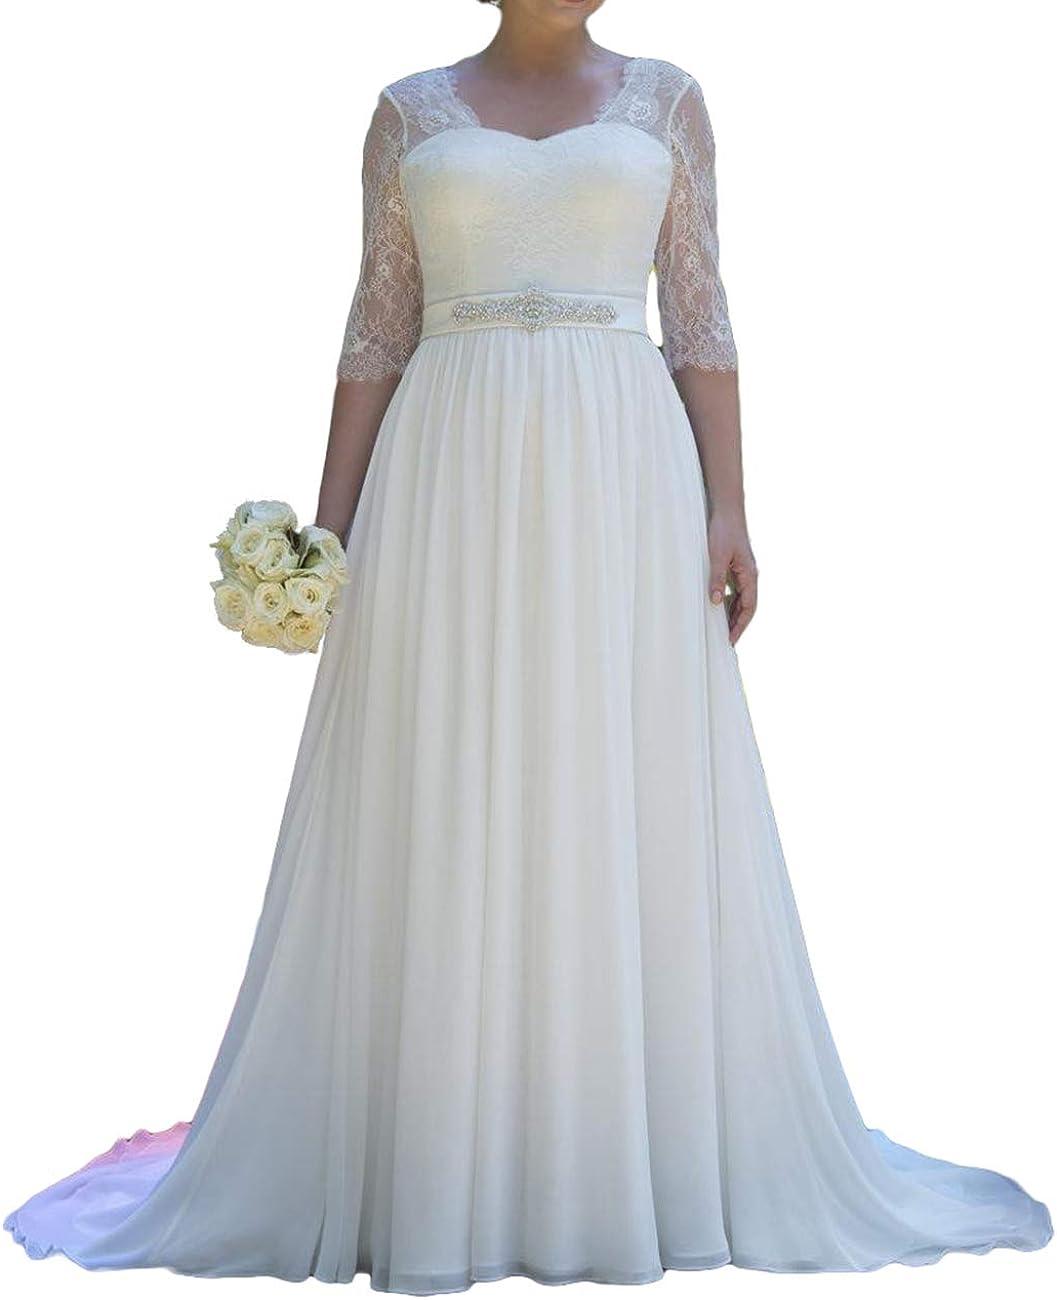 Wedding Dresses for Bride Lace Bridal Gowms Beach Bride Dress Chiffon Wedding Gown